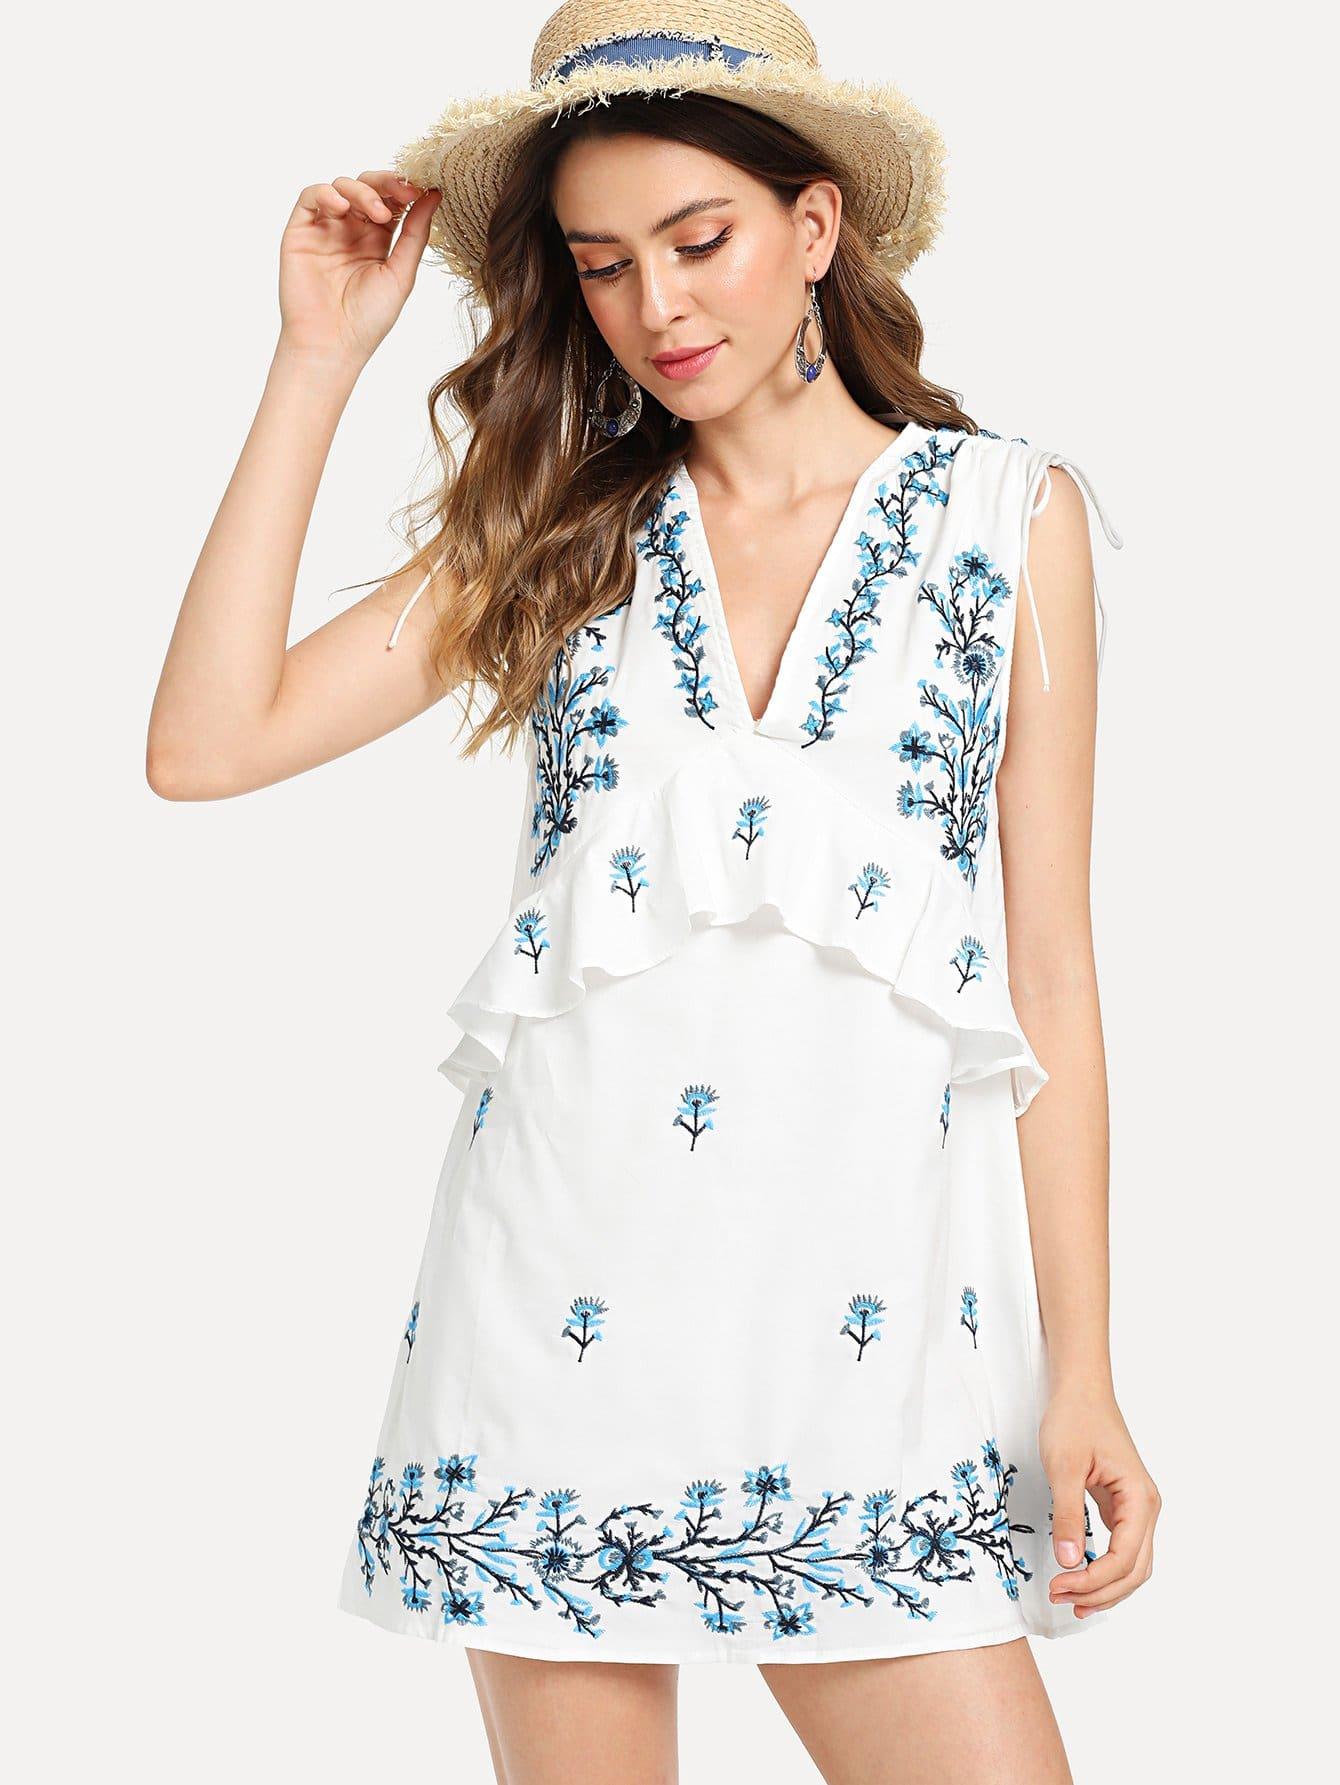 Ruffle Trim Embroidered Dress ruffle trim a line dress